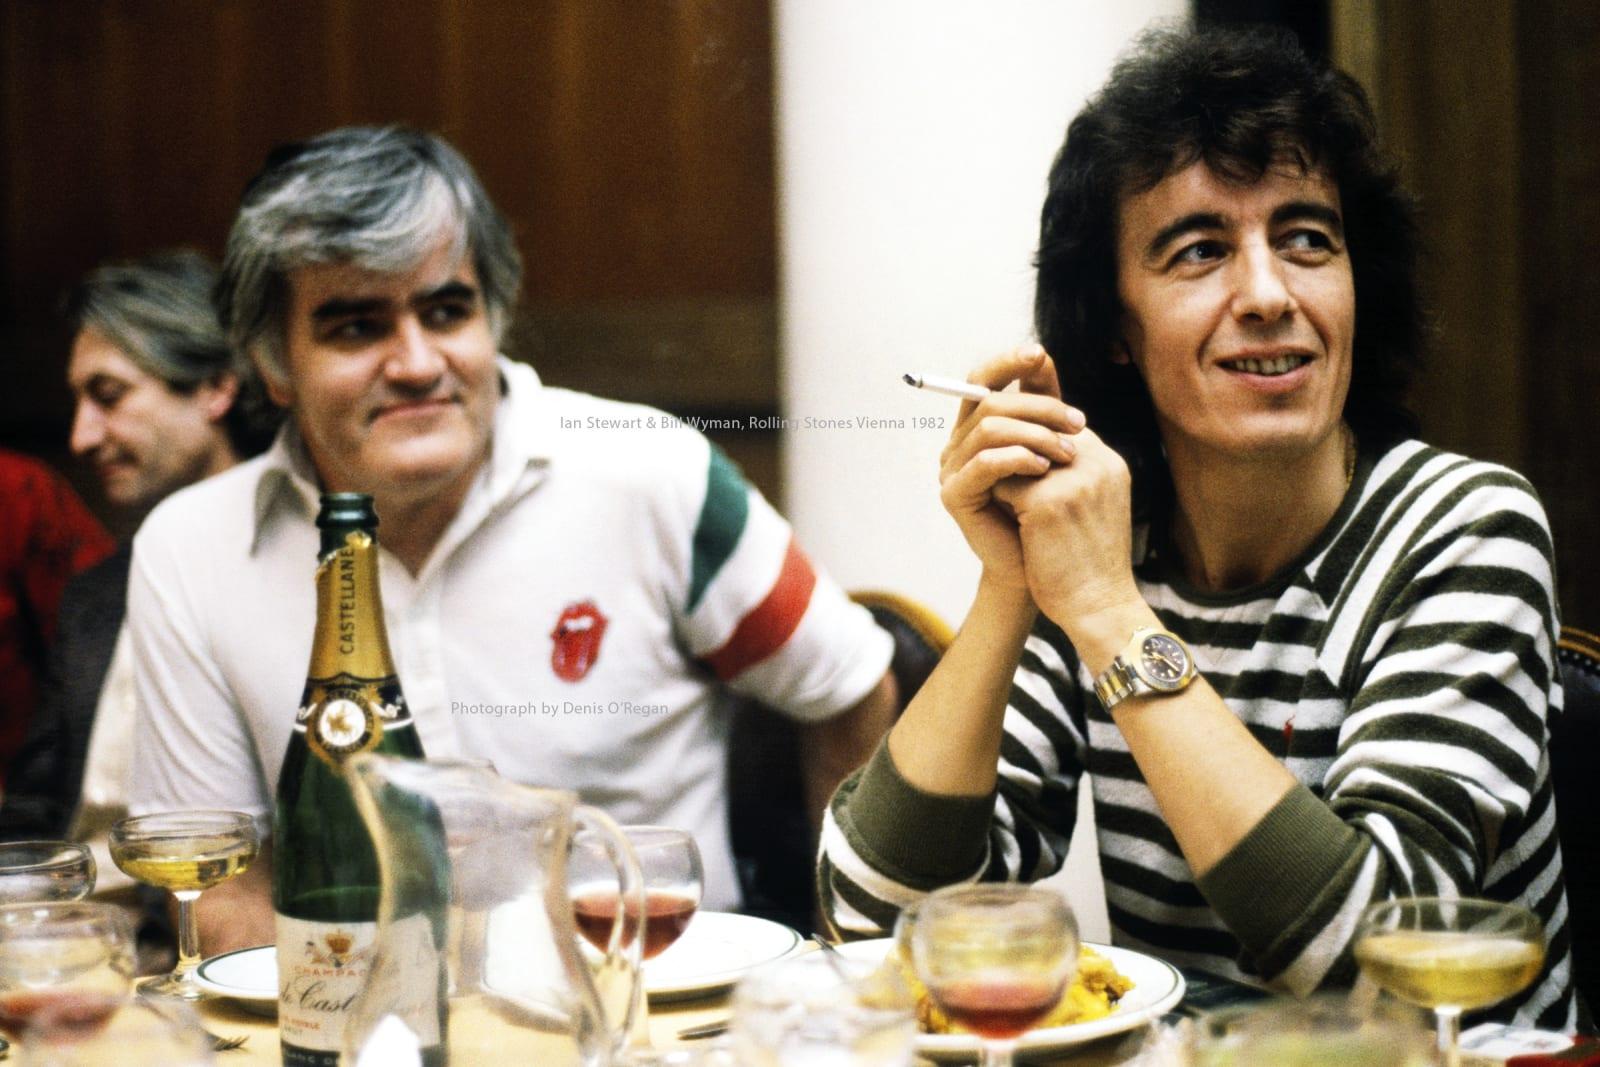 ROLLING STONES, Ian Stewart & Bill Wyman Vienna, 1982